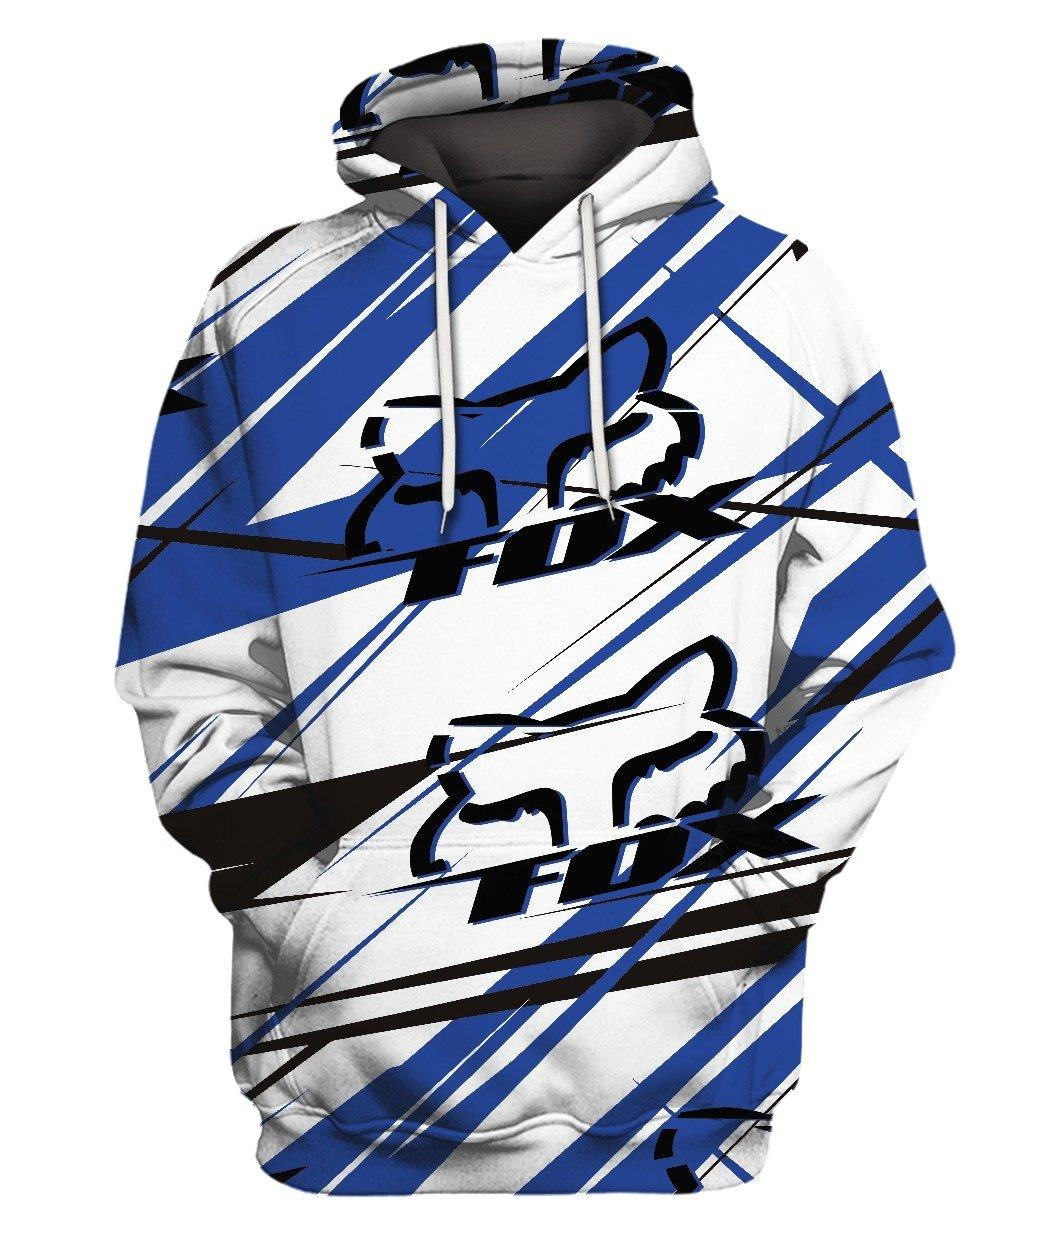 Fox Bike Blue 3d Full Print Hoodie 3d Graphic Printed Tshirt Hoodie Up To 5xl